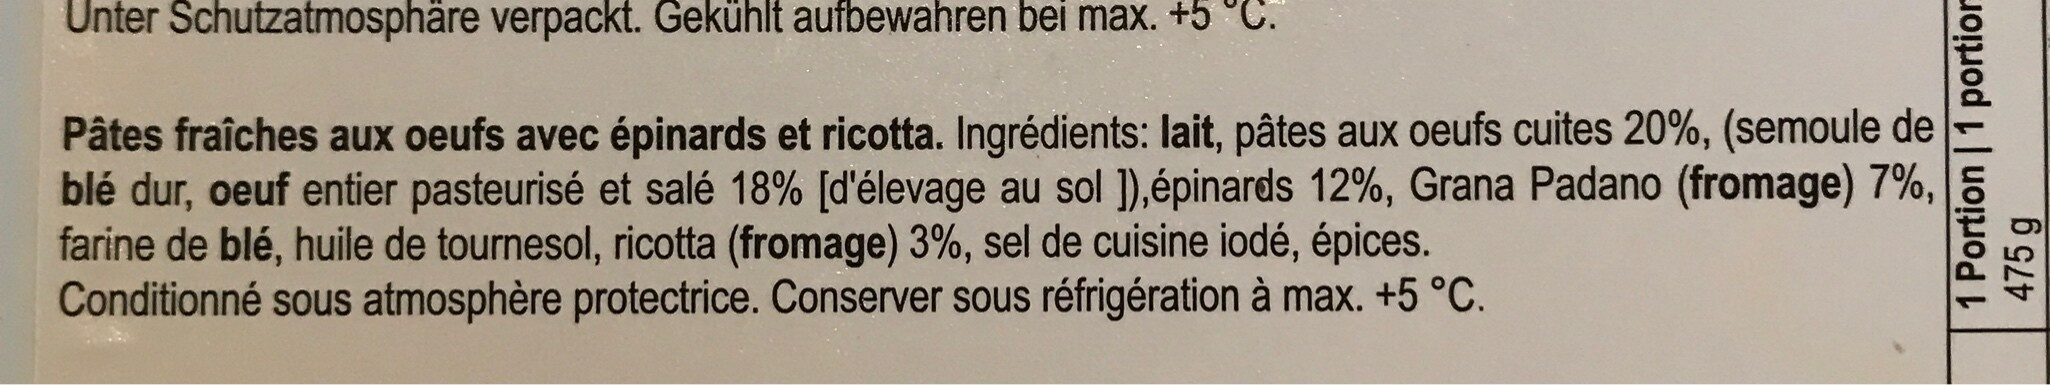 Lasagne frais épinards et ricotta - Inhaltsstoffe - fr